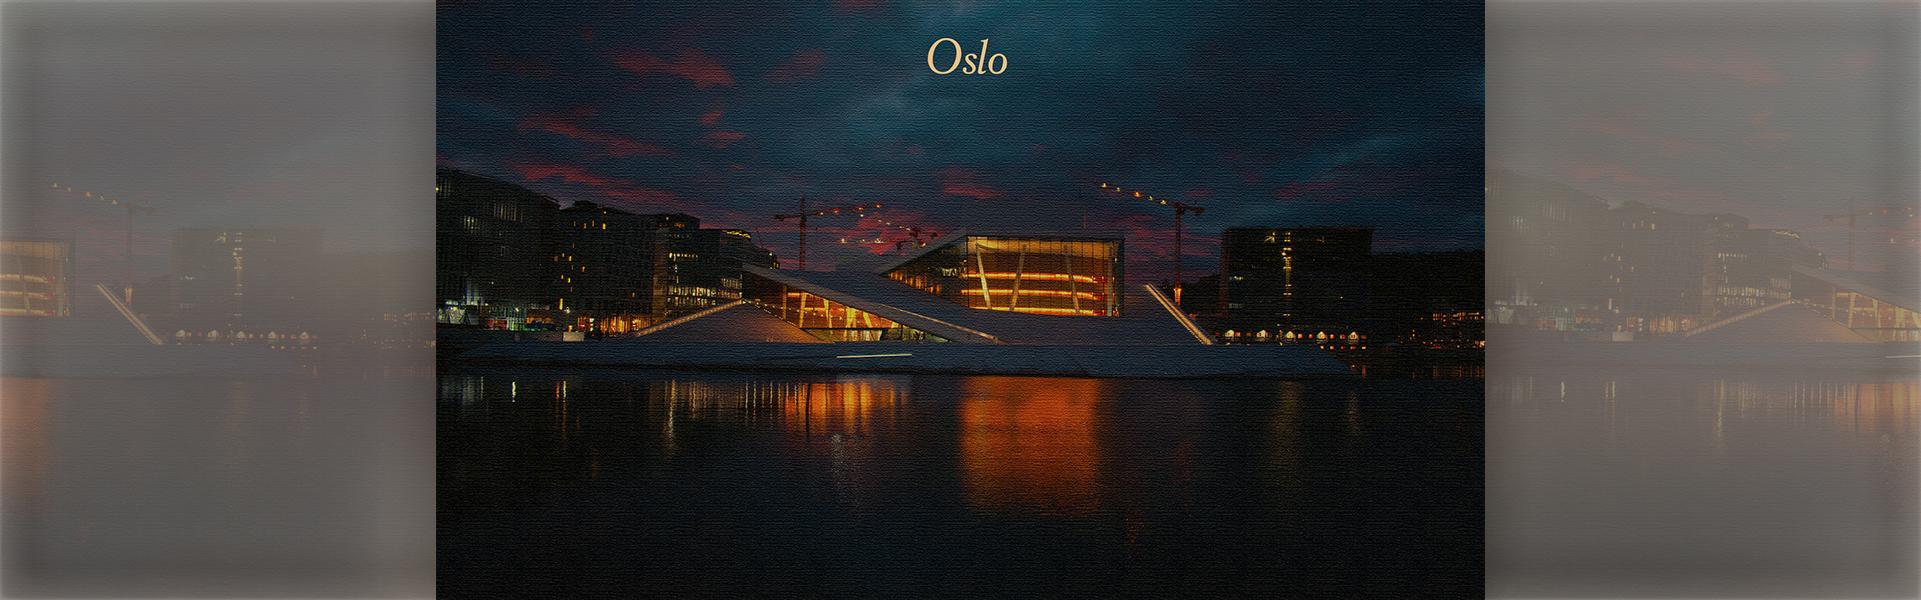 Oslo 4new слайдер 2